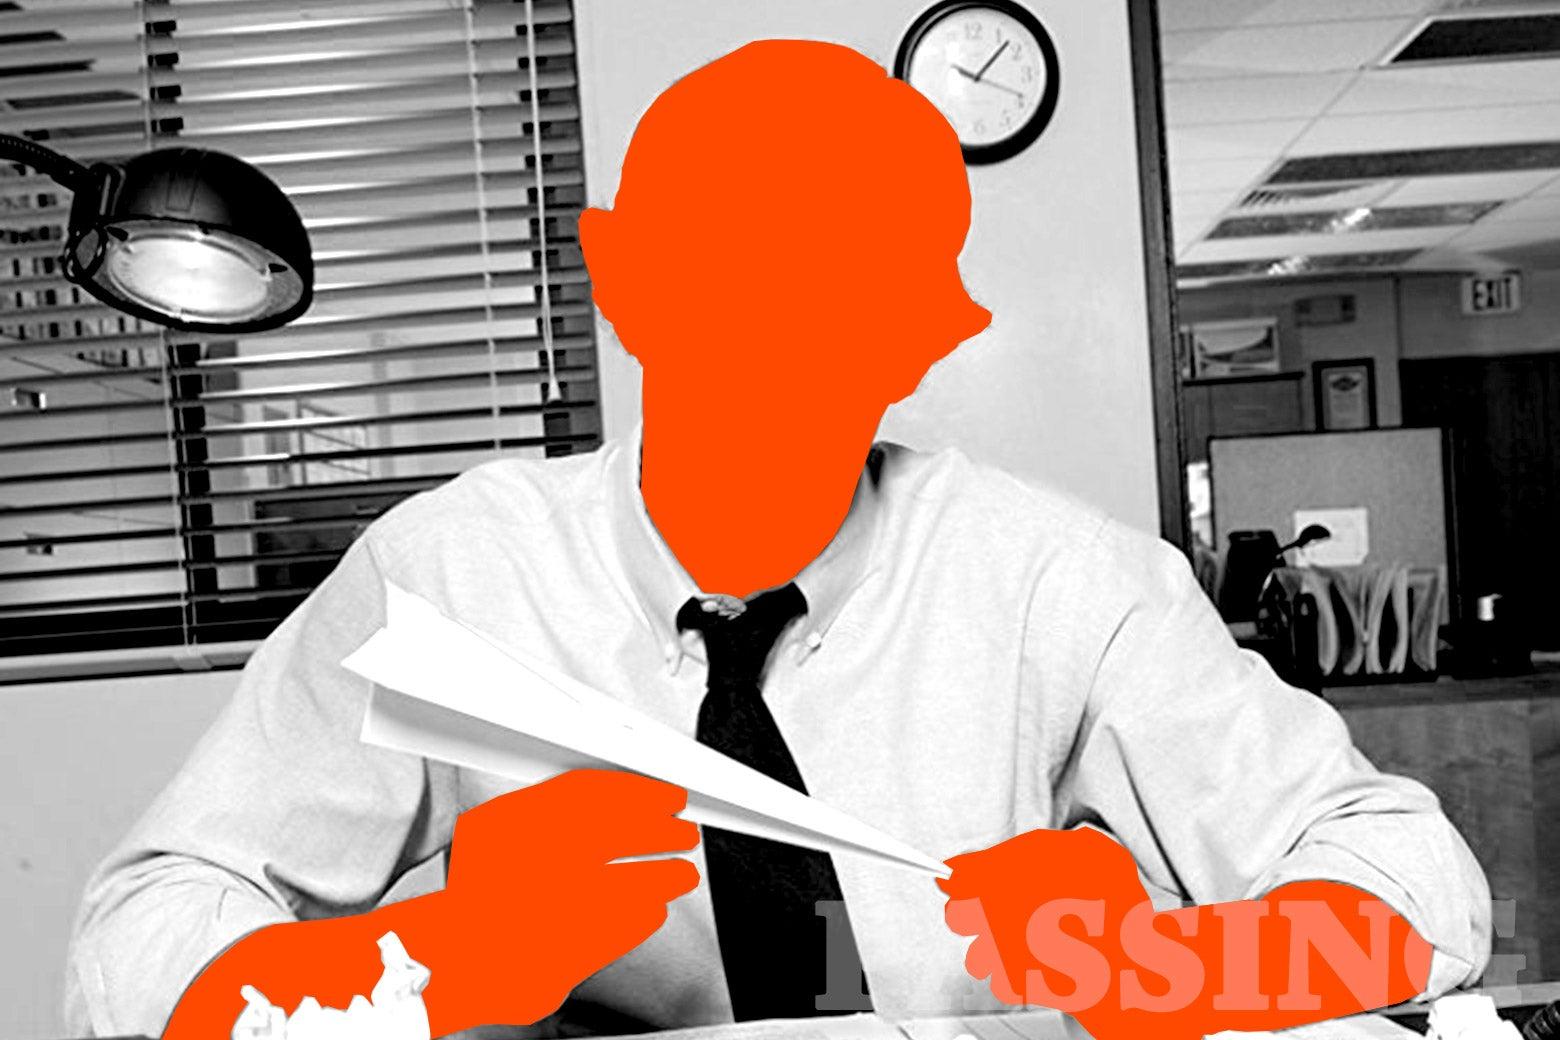 John Krasinski as Jim Halpert in The Office, silhouetted out in orange.